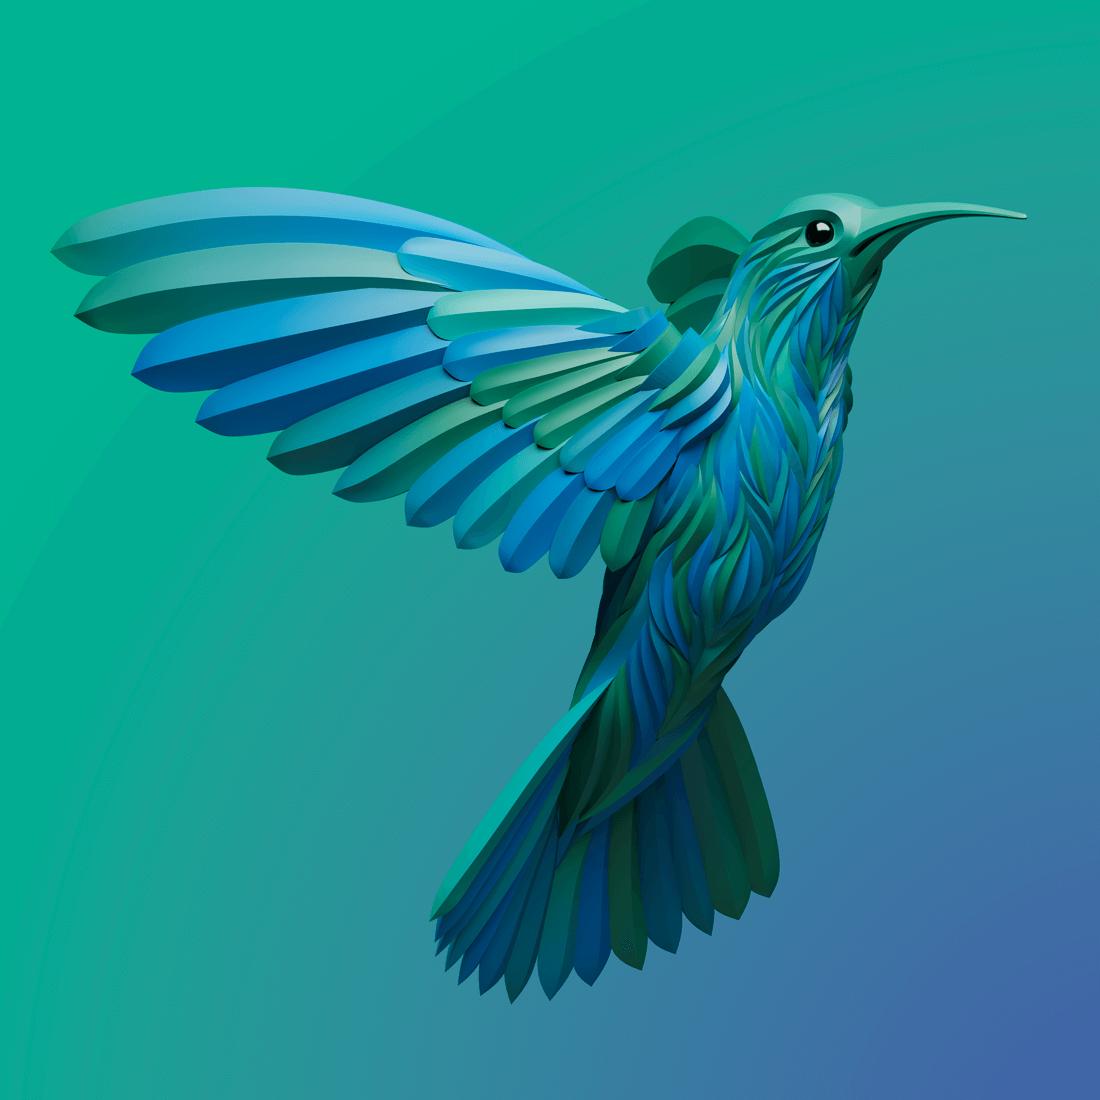 colibri max shkre